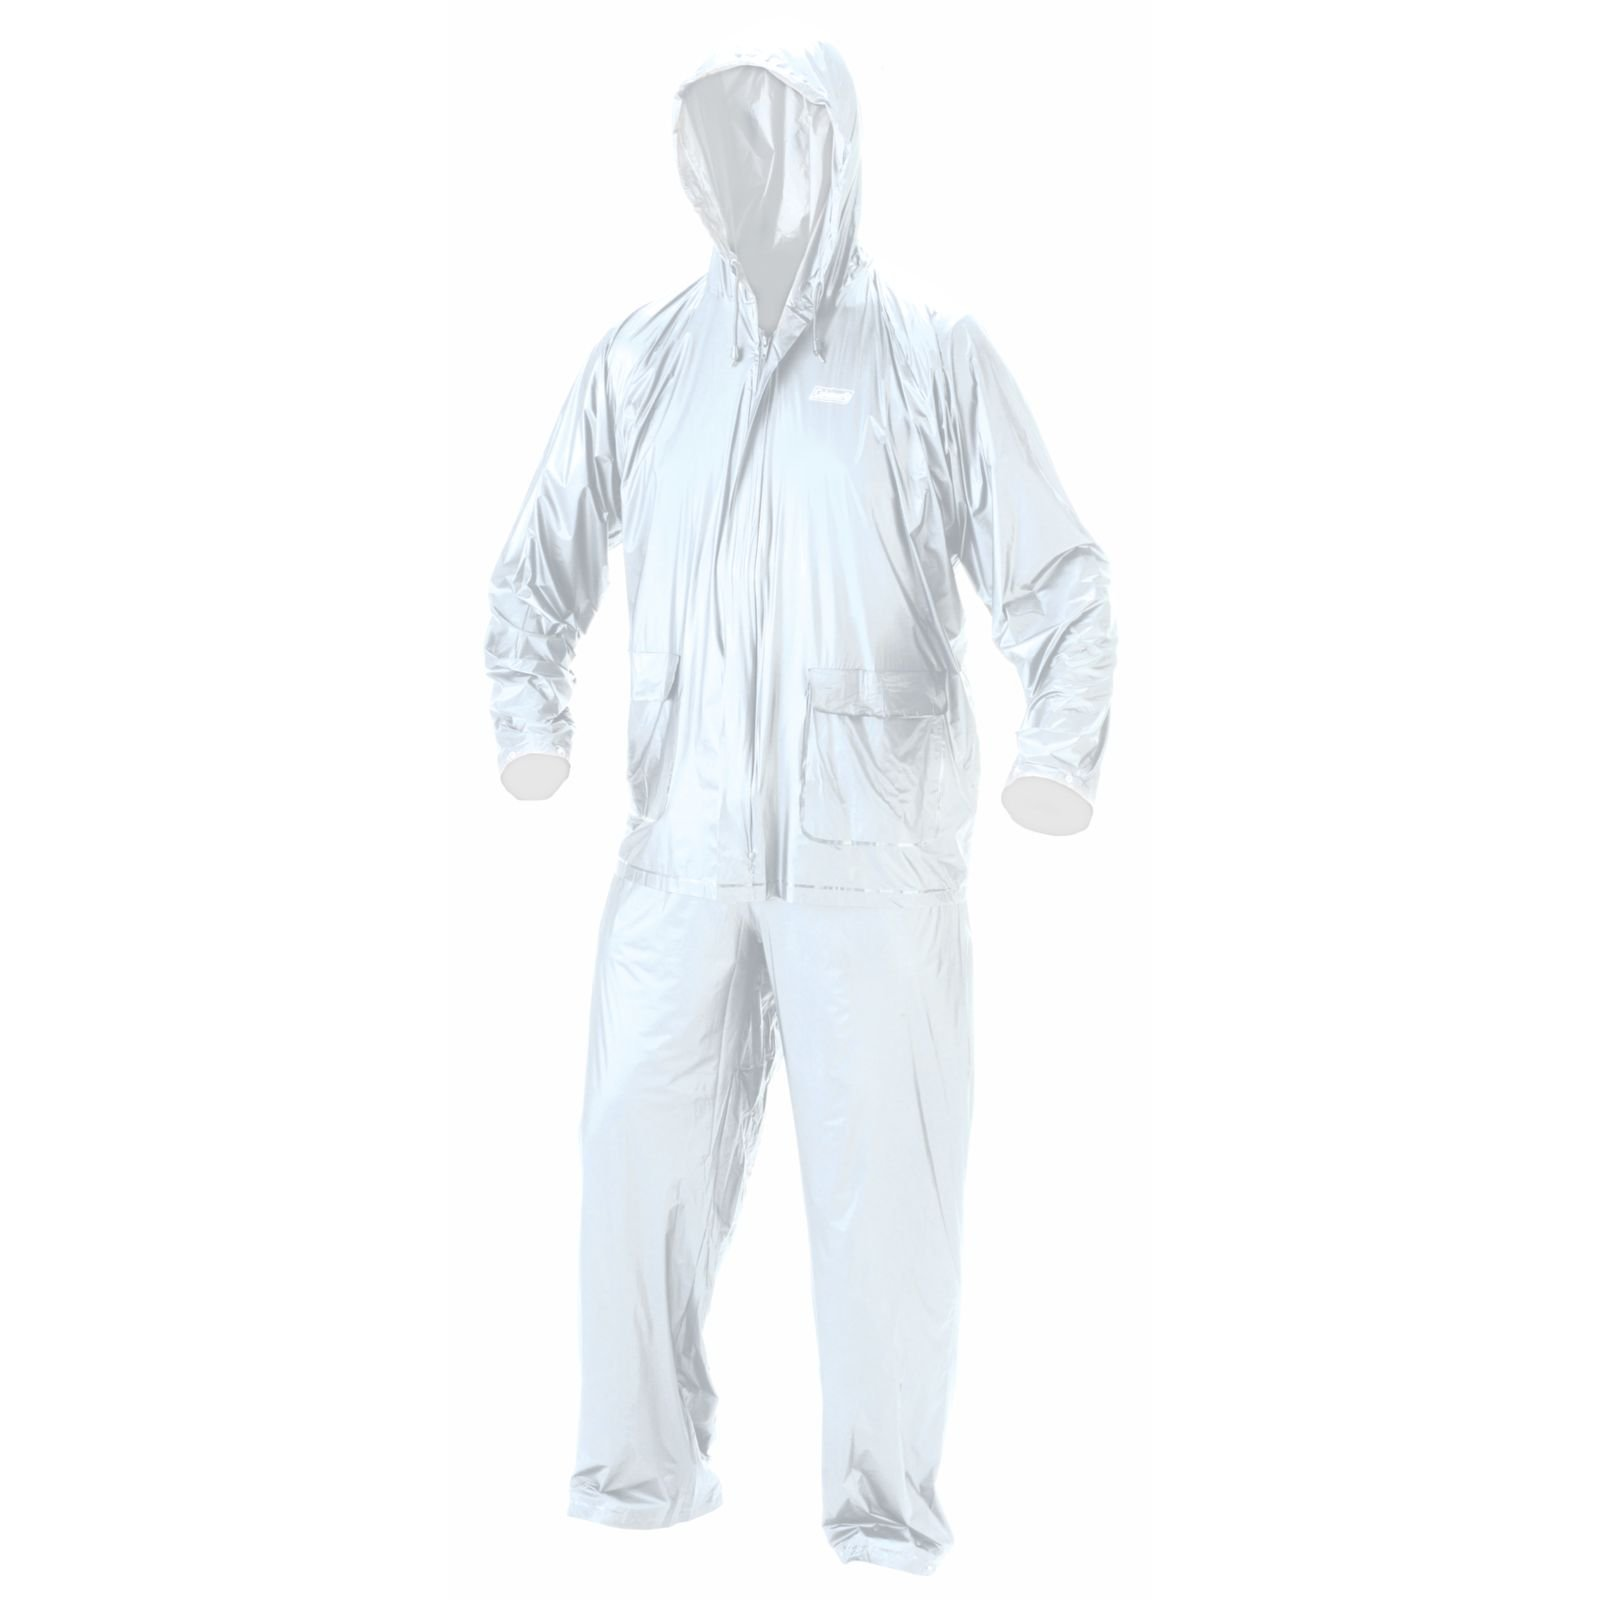 Coleman 10 mm PVC Rain Suit, Clear, Small